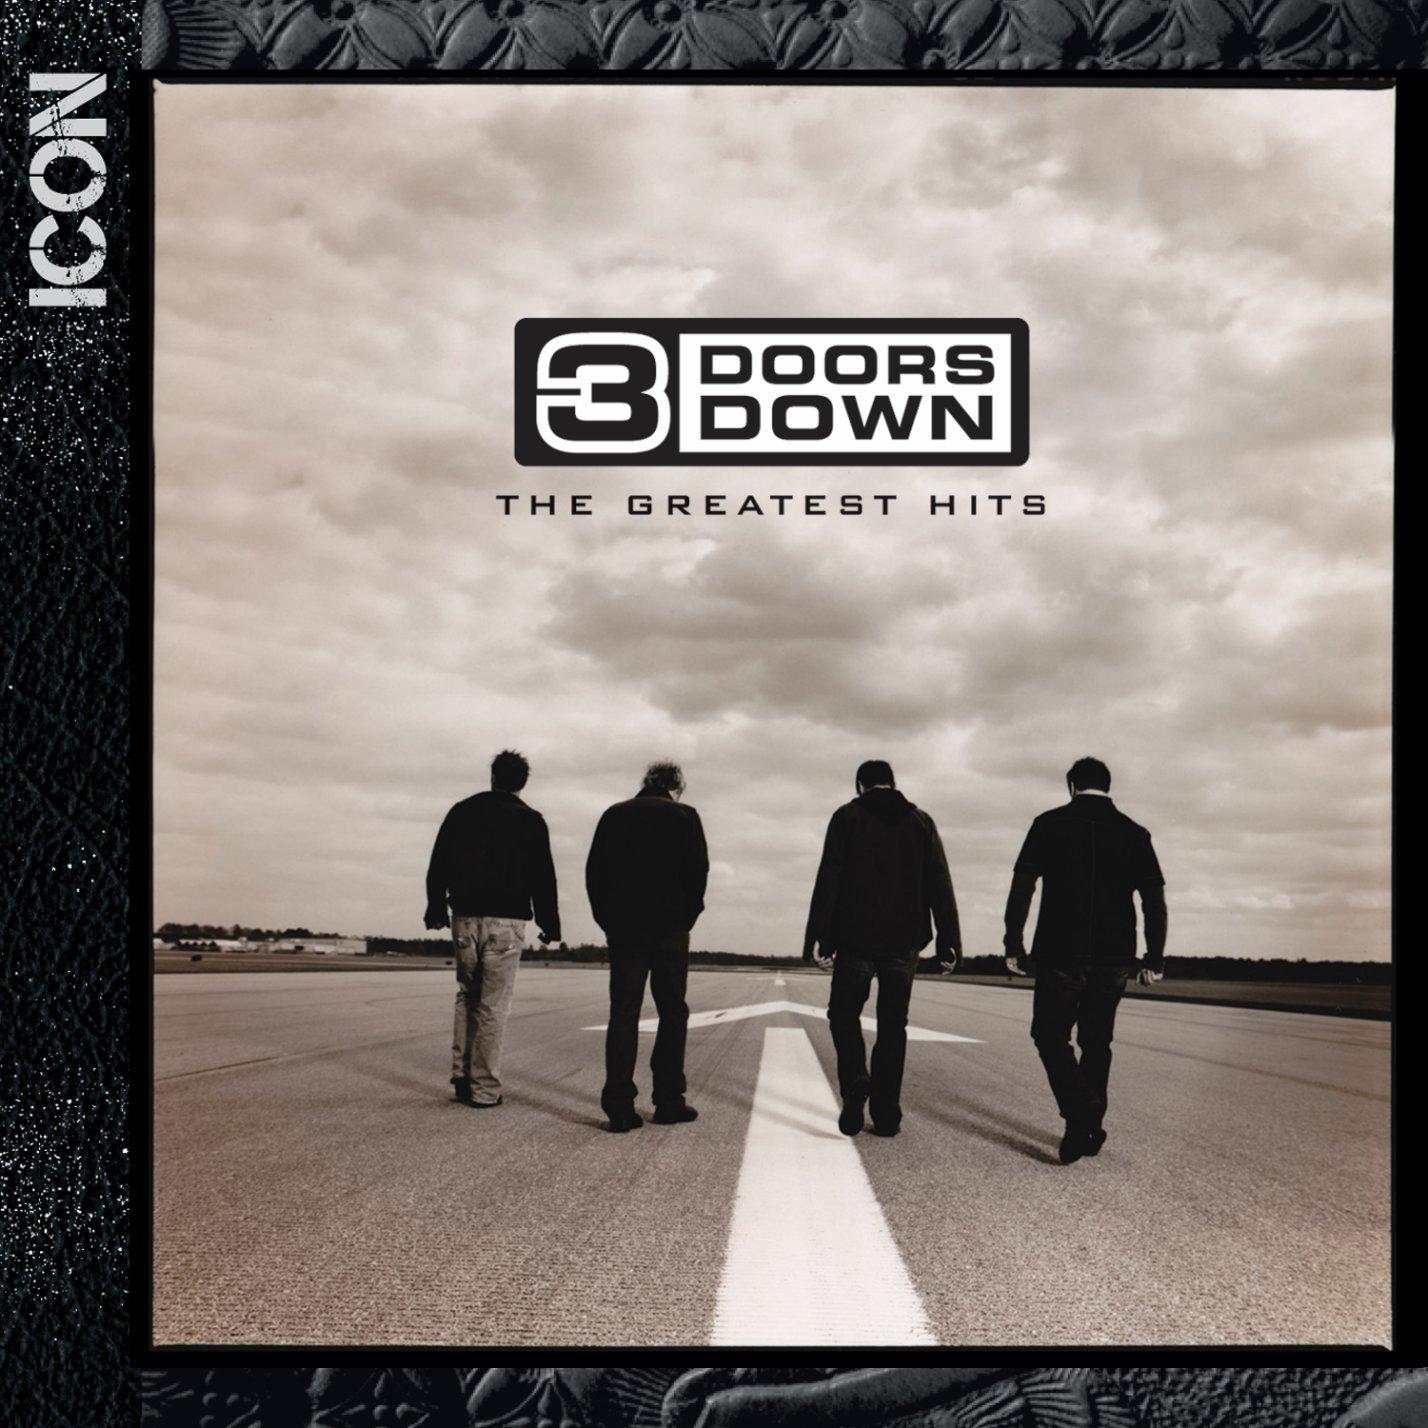 & 3 Doors Down - ICON: The Greatest Hits - Amazon.com Music